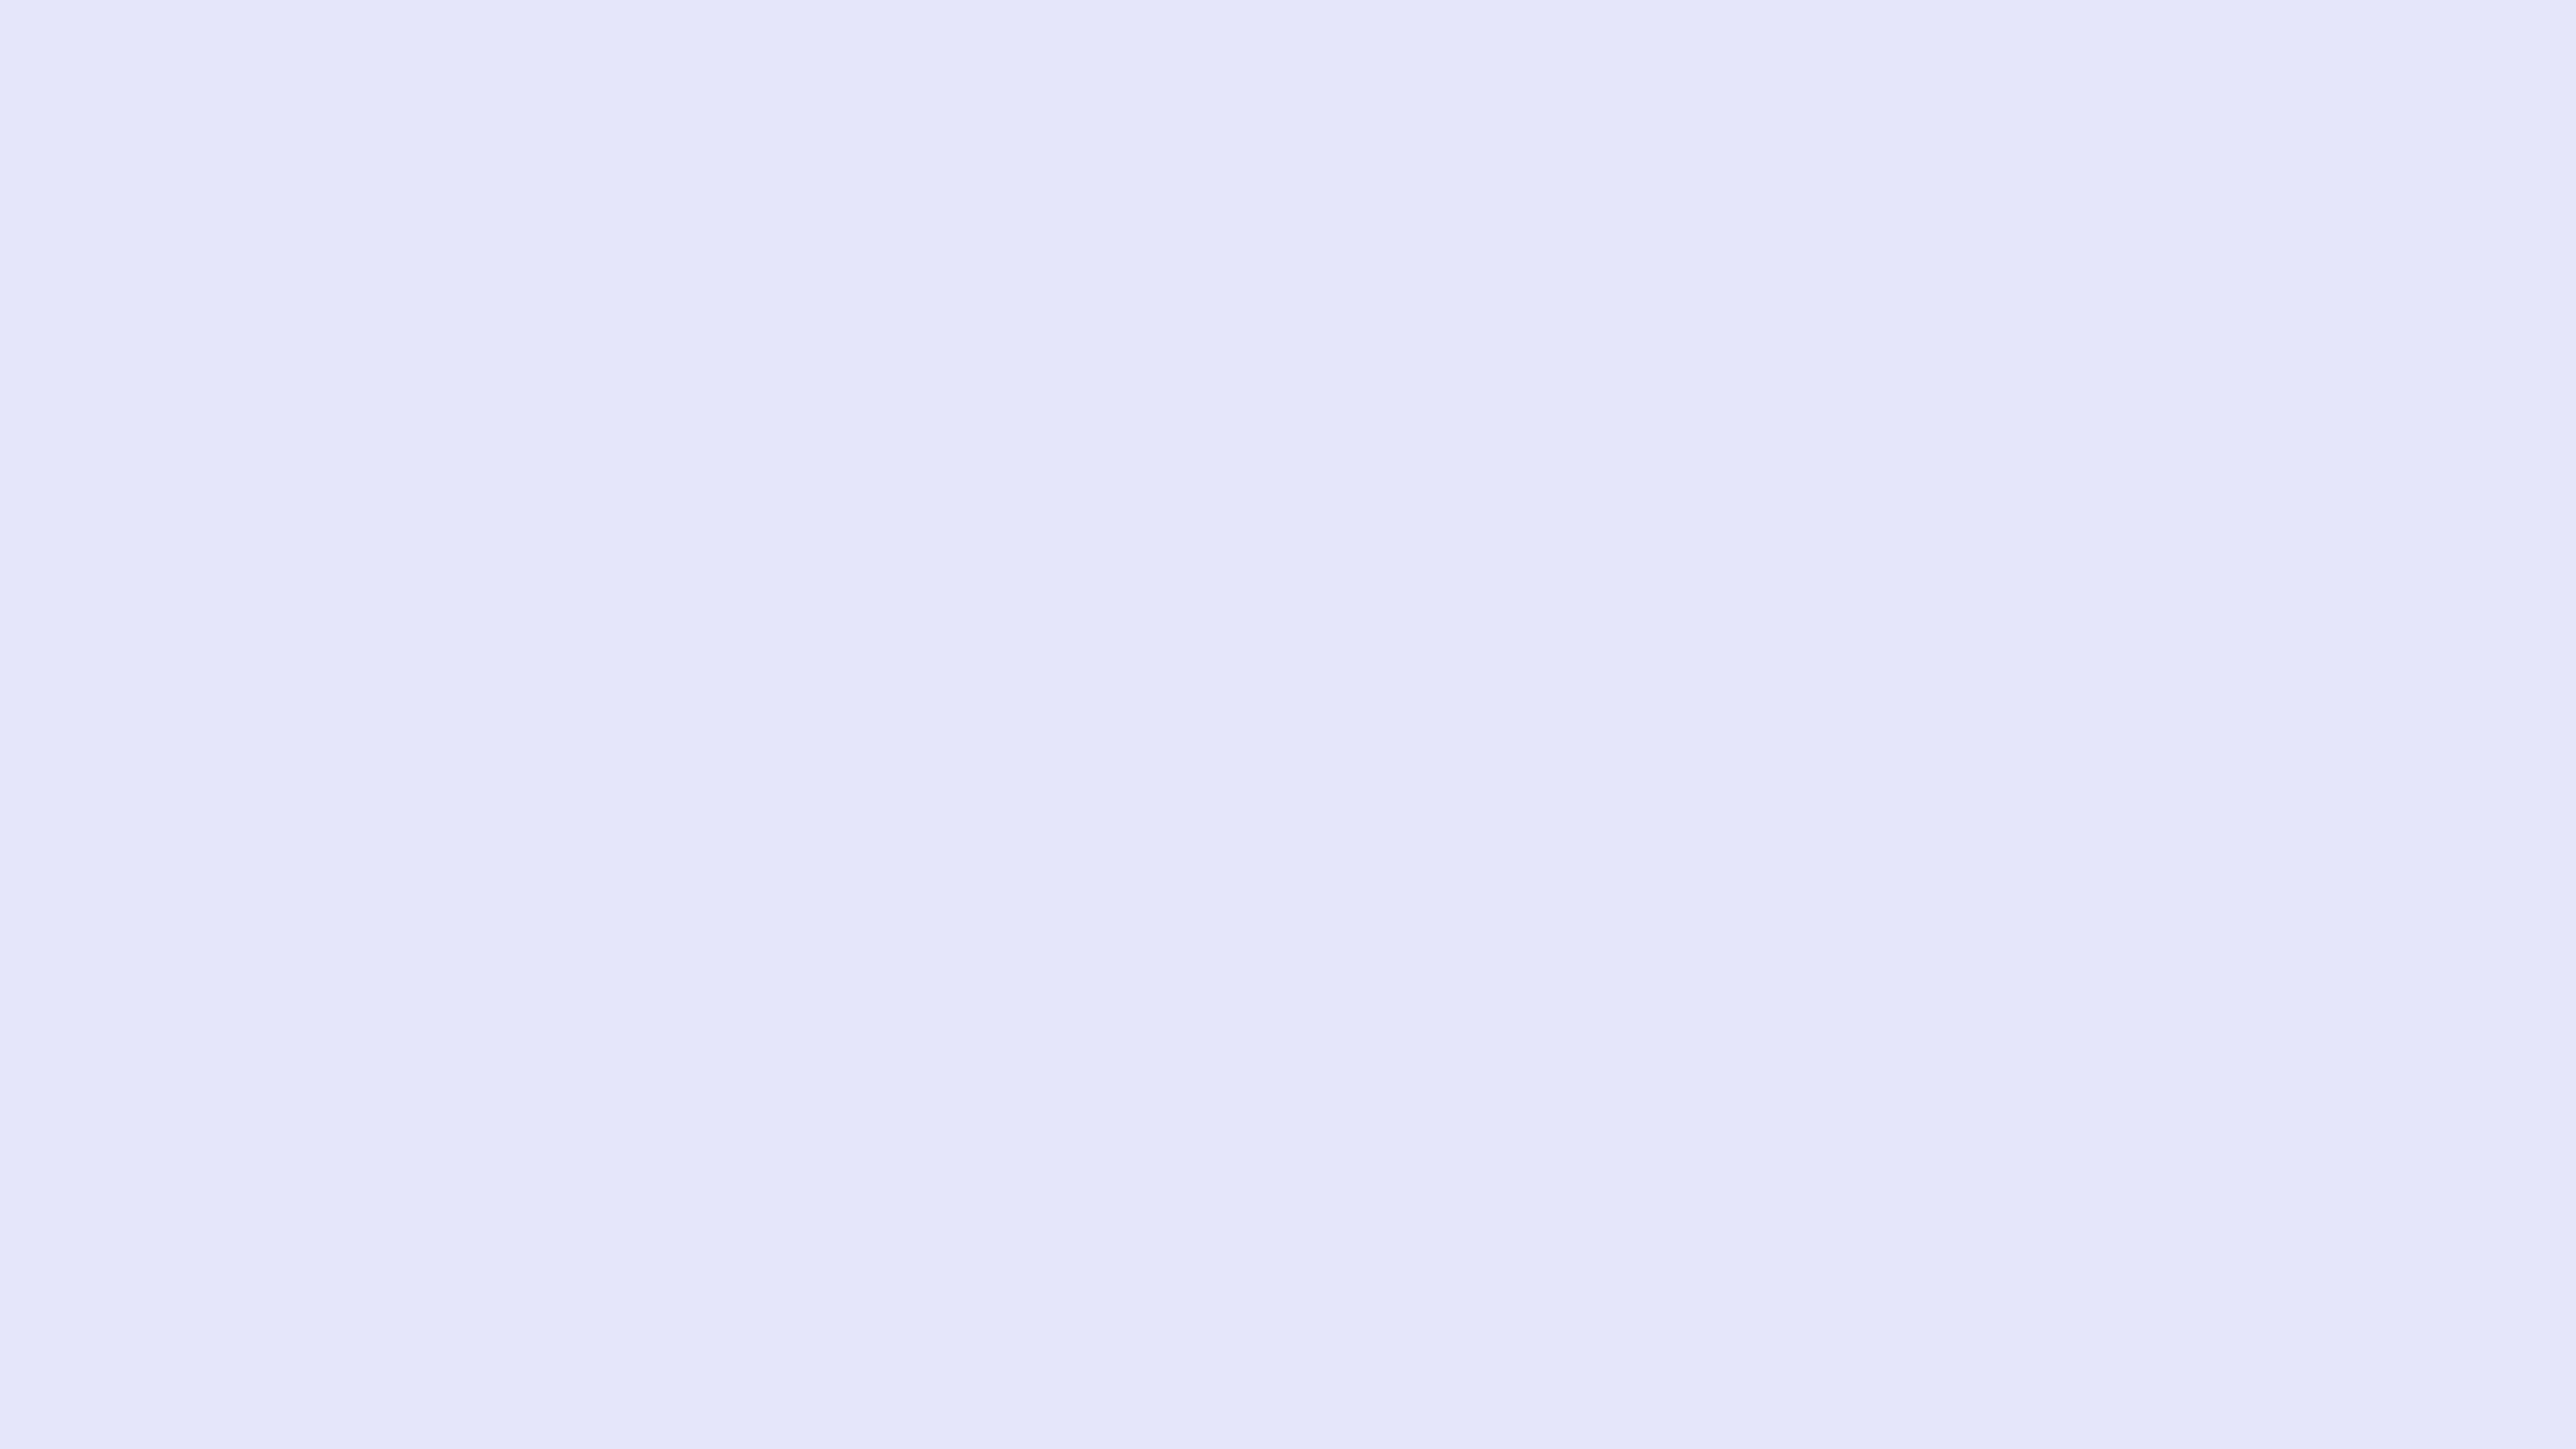 4096x2304 Lavender Web Solid Color Background